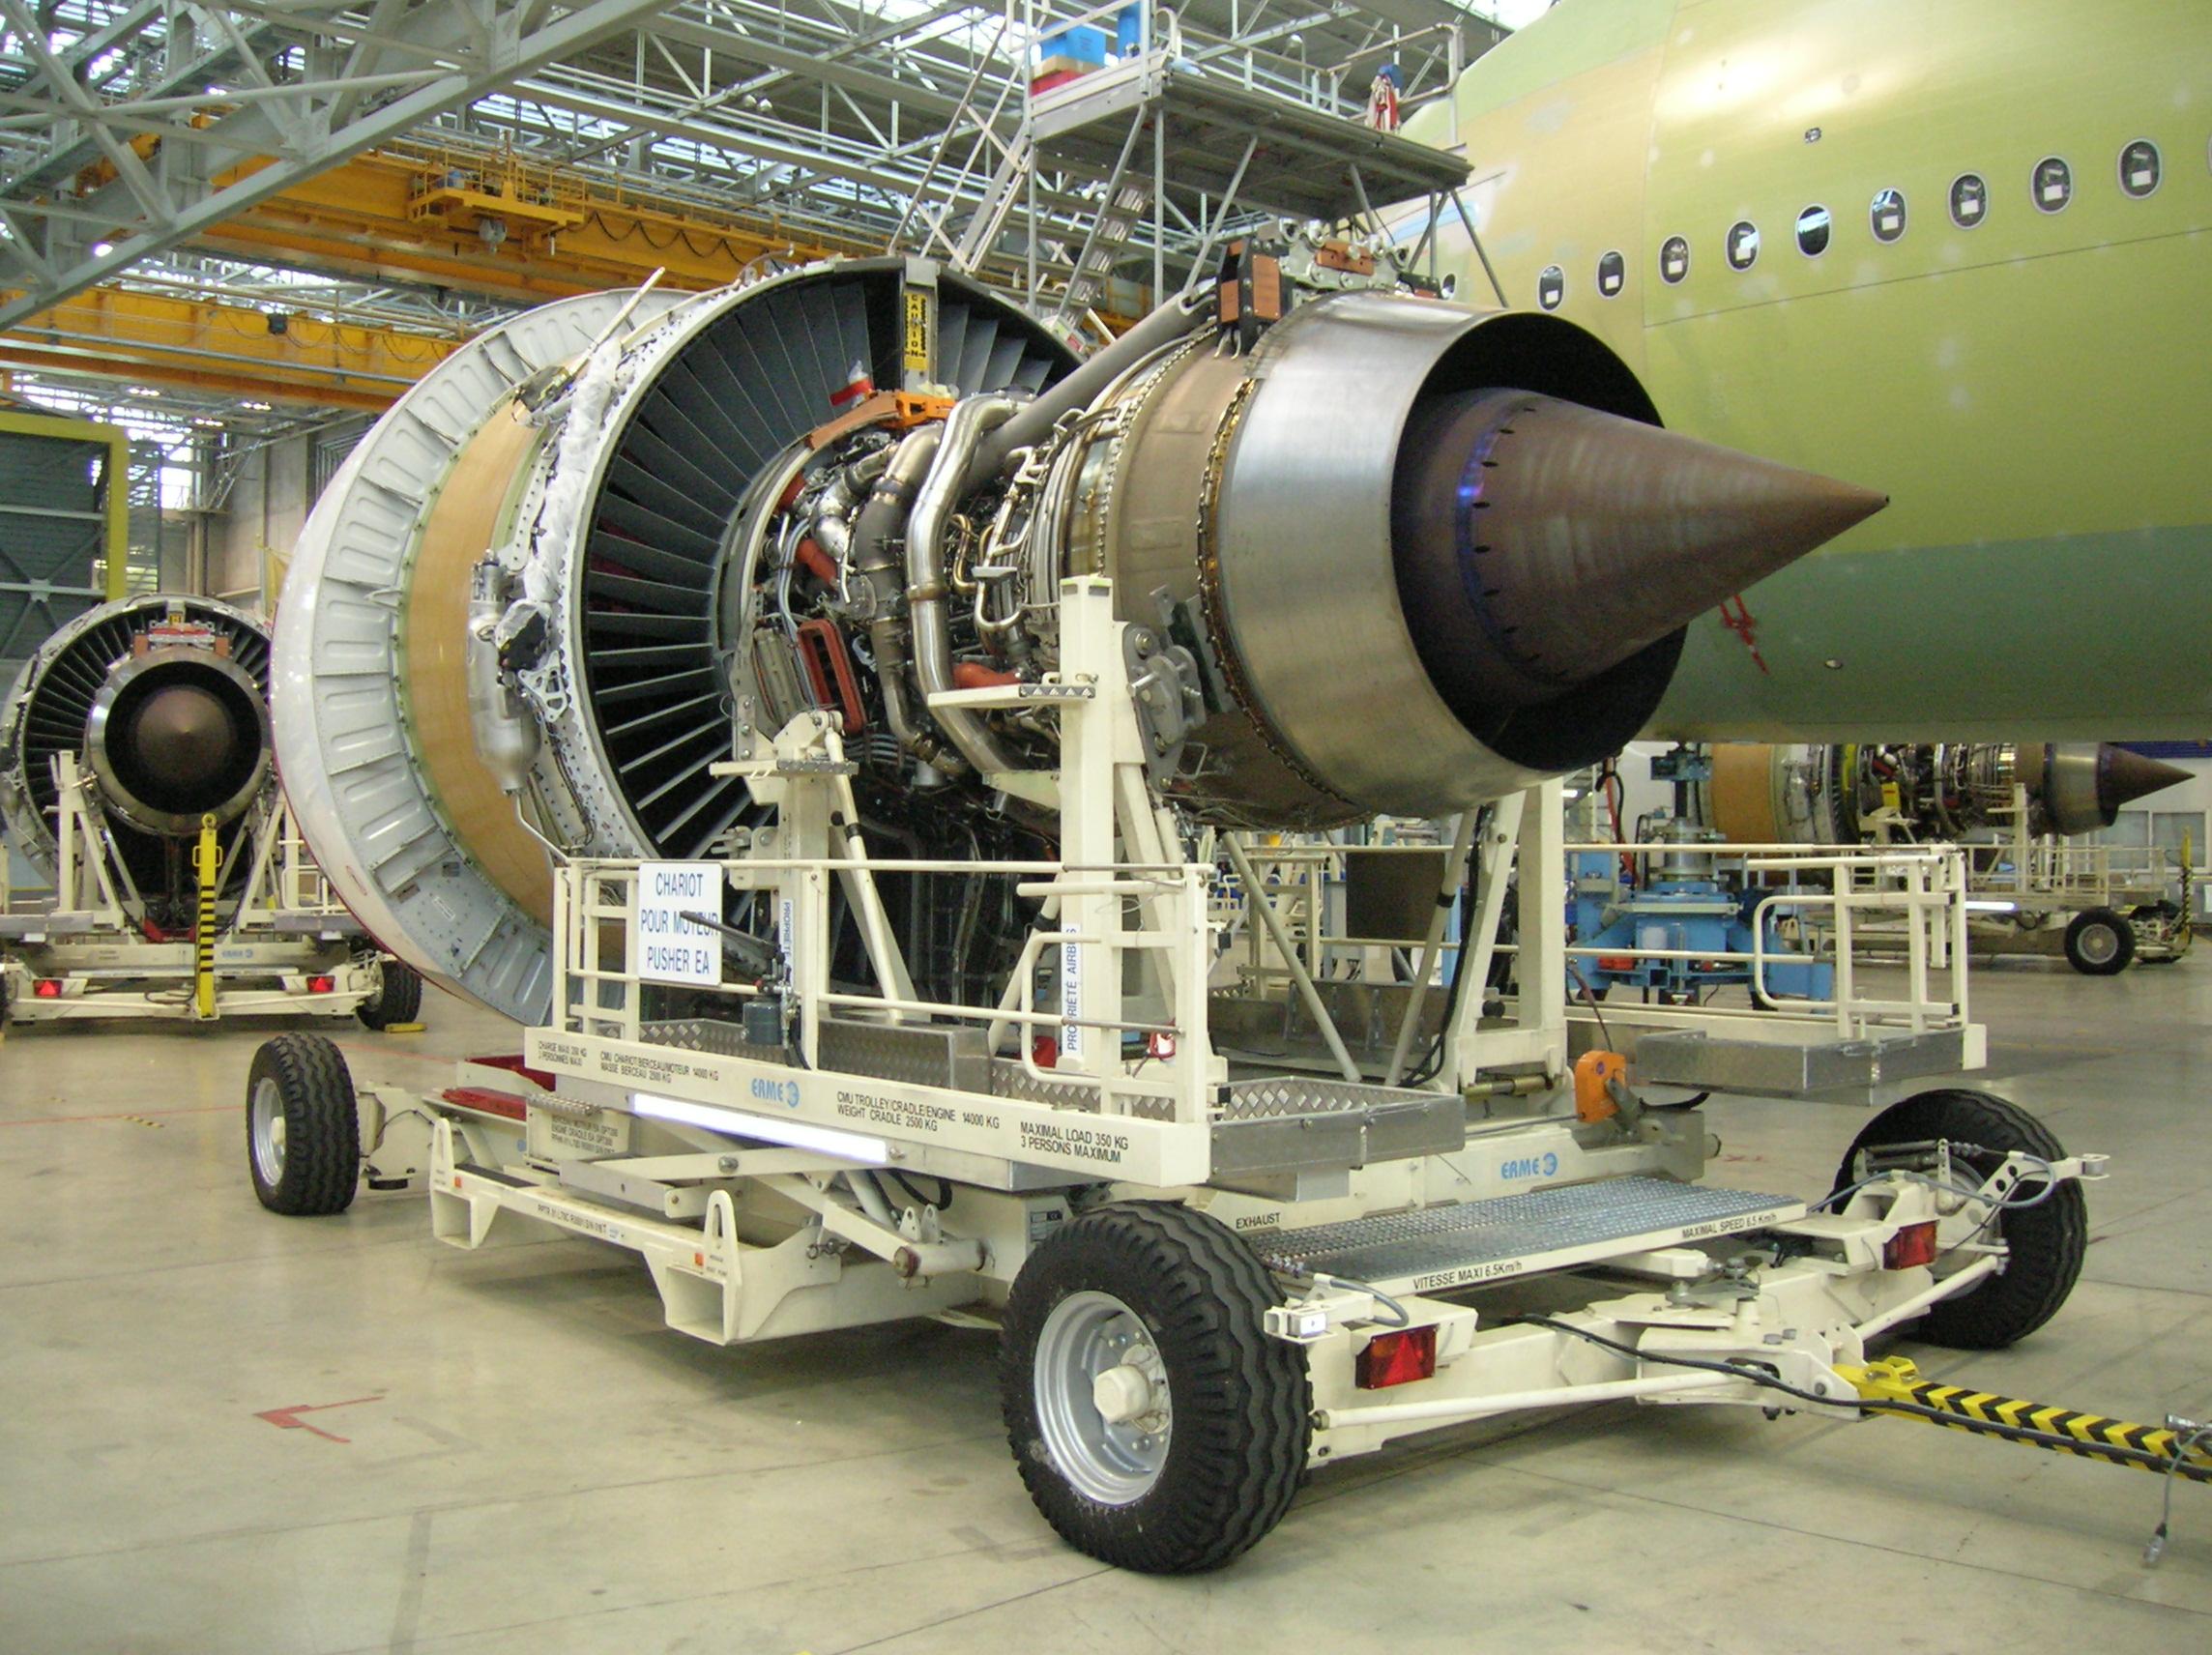 Engine Alliance GP7000 turbofan awaiting installation on an Airbus